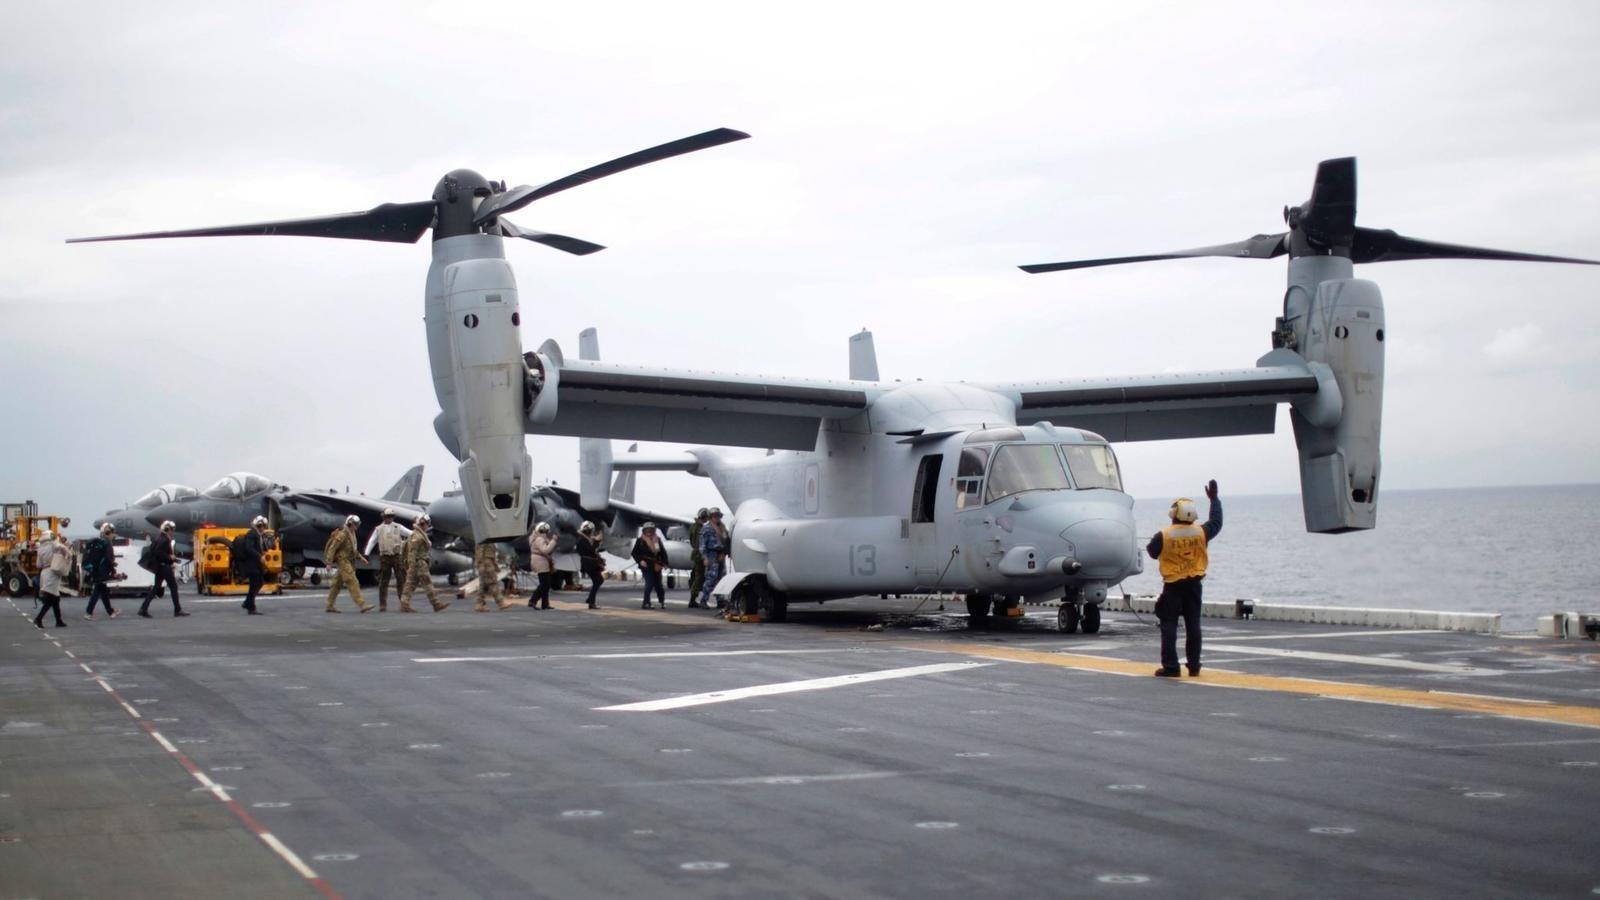 A Marines MV-22B Osprey on the deck of the USS Bonhomme Richard assault ship off Sydney on June 29. (AFP Photo)